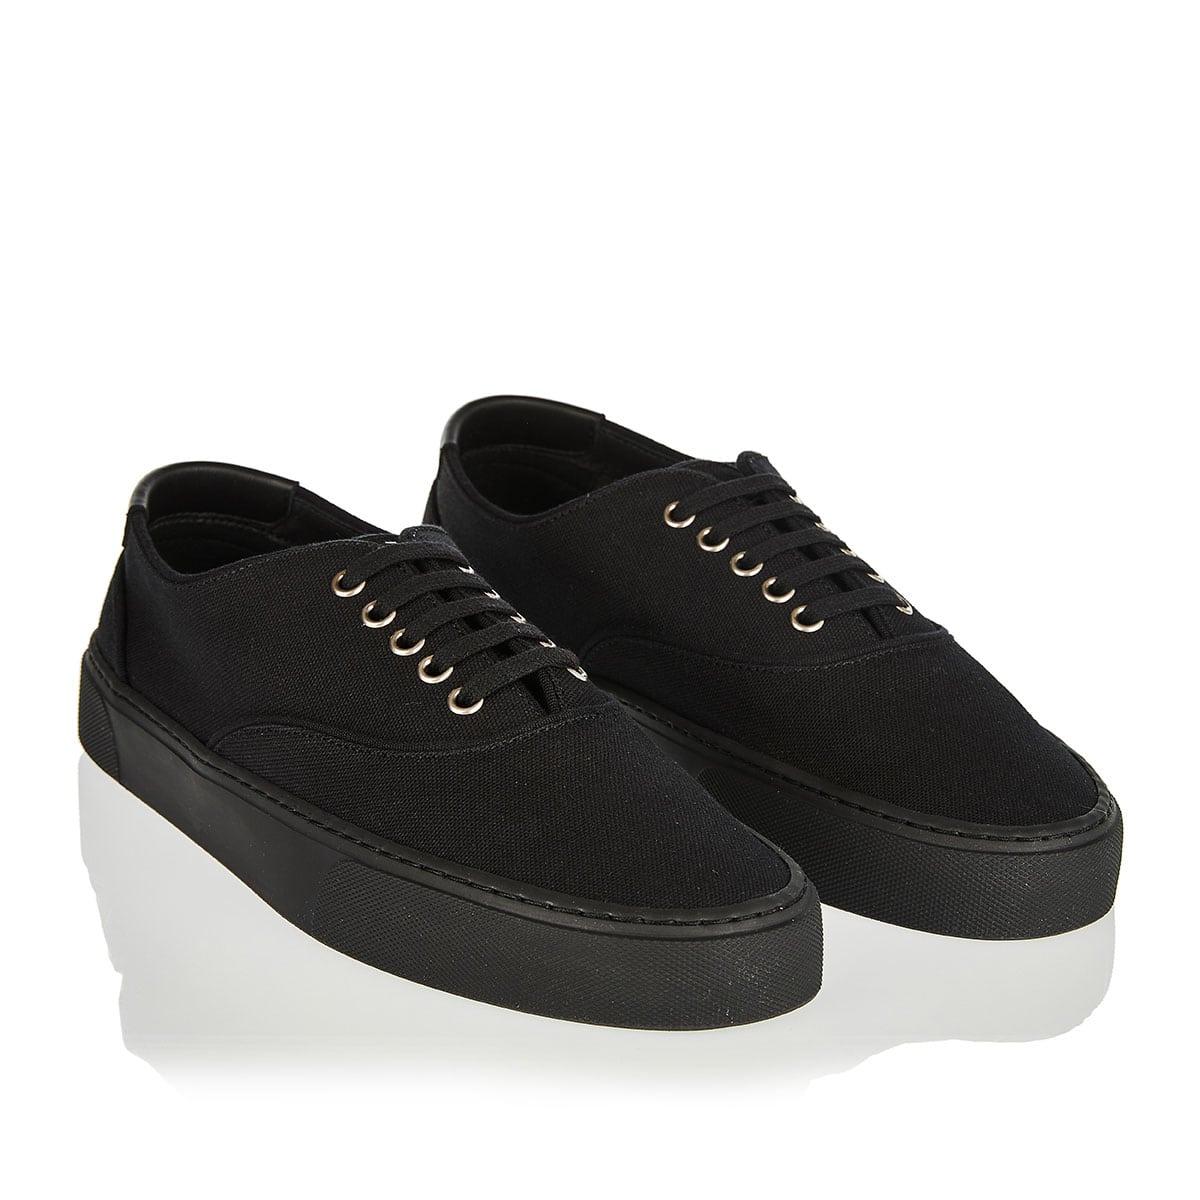 Venice canvas sneakers